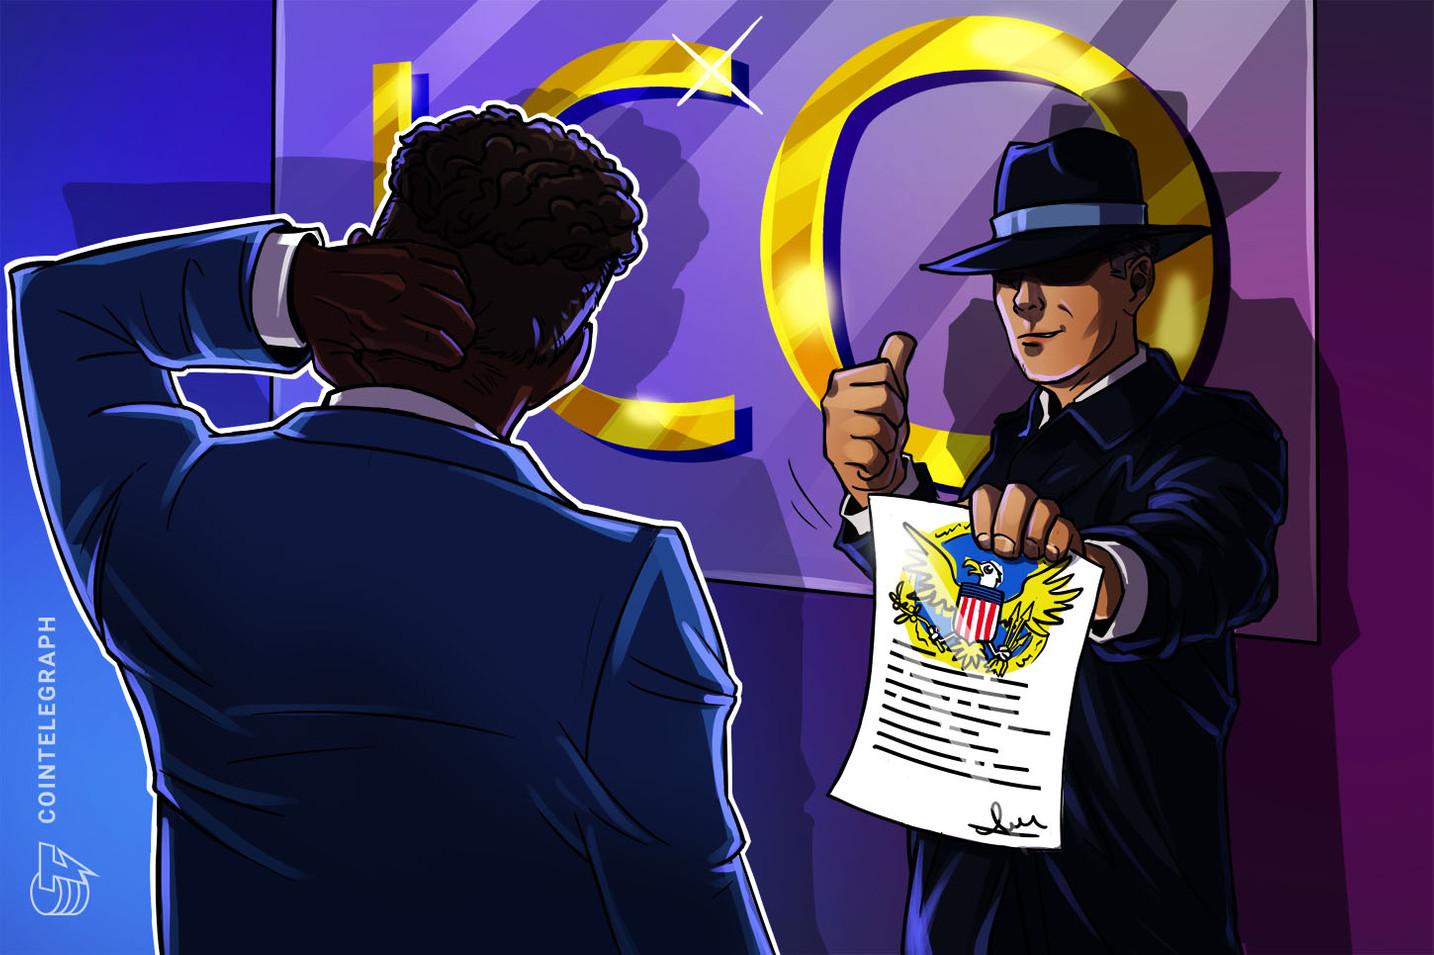 SEC、未登録証券の発行で加のチャットアプリを訴追  仮想通貨の価値上がると投資家に約束か